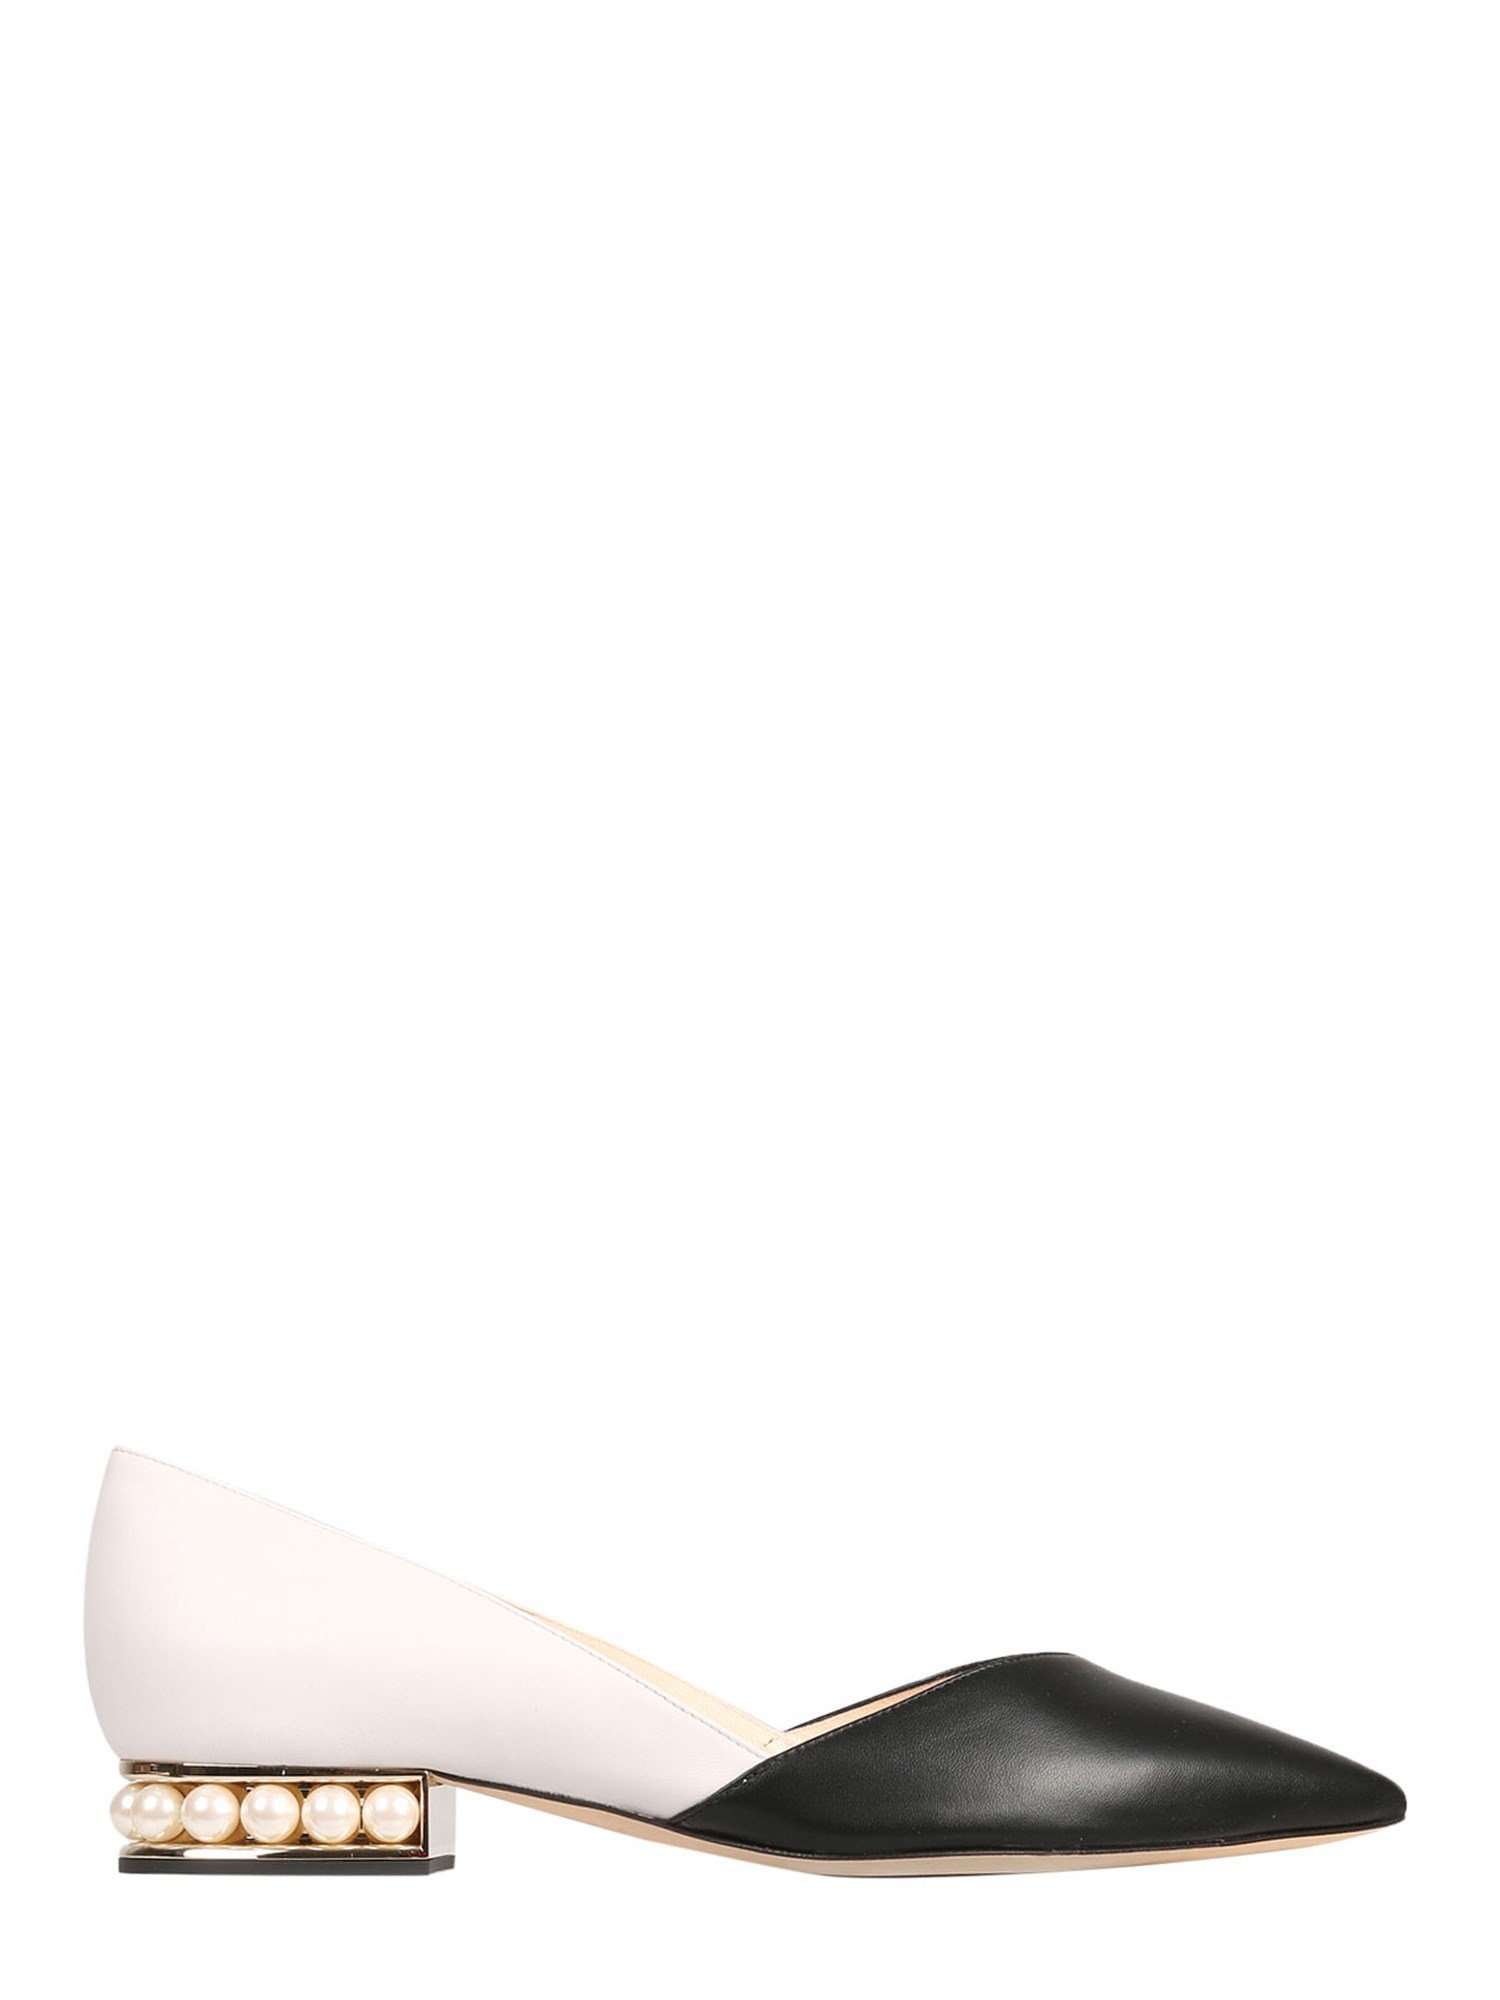 Casati d'orsay heel ballerinas - nicholas kirkwood - Modalova